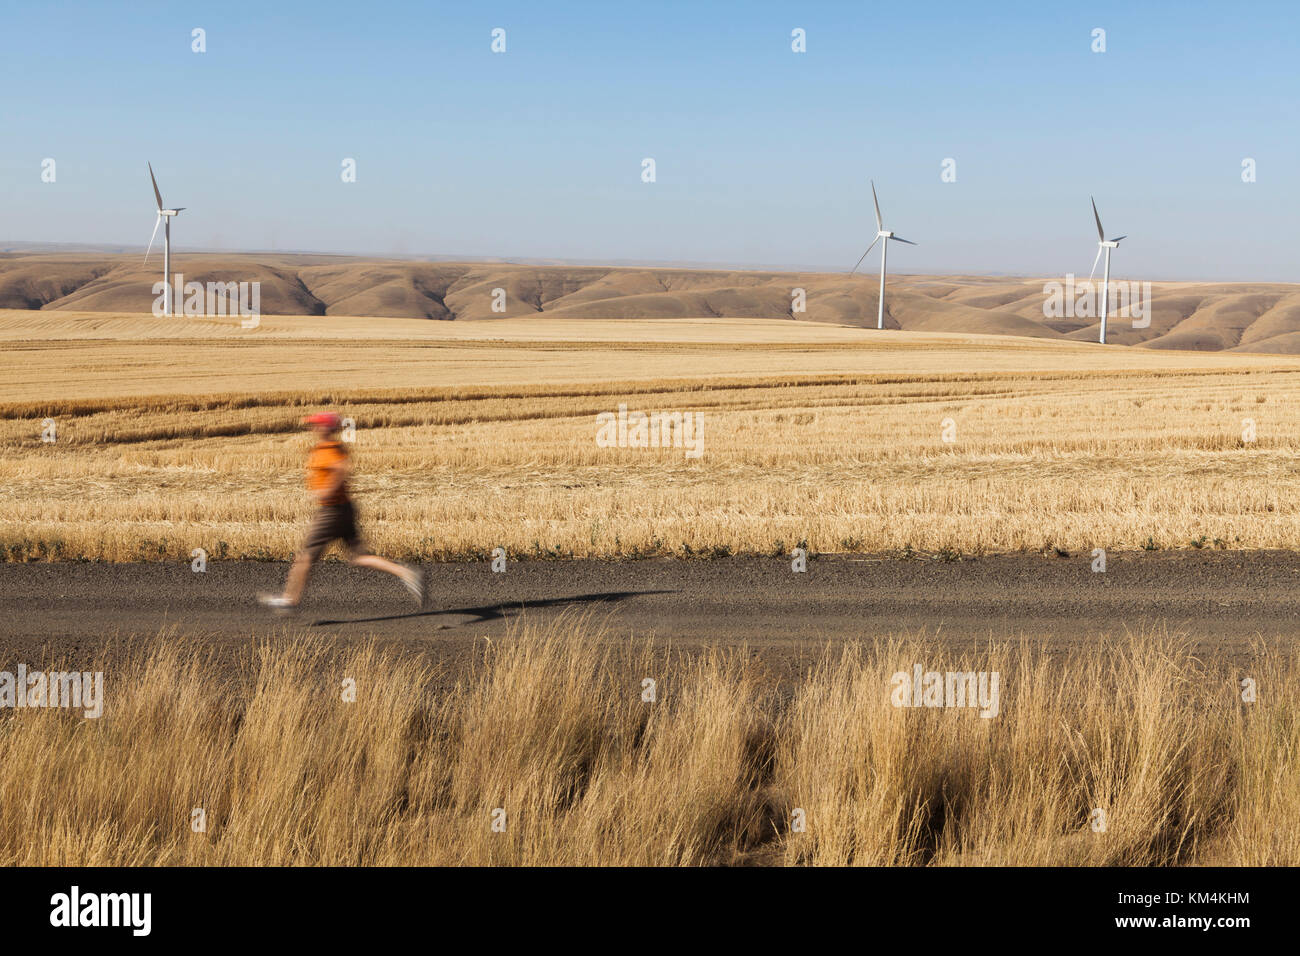 Man jogging on rural road, farmland and wind turbines in distance, Washington - Stock Image